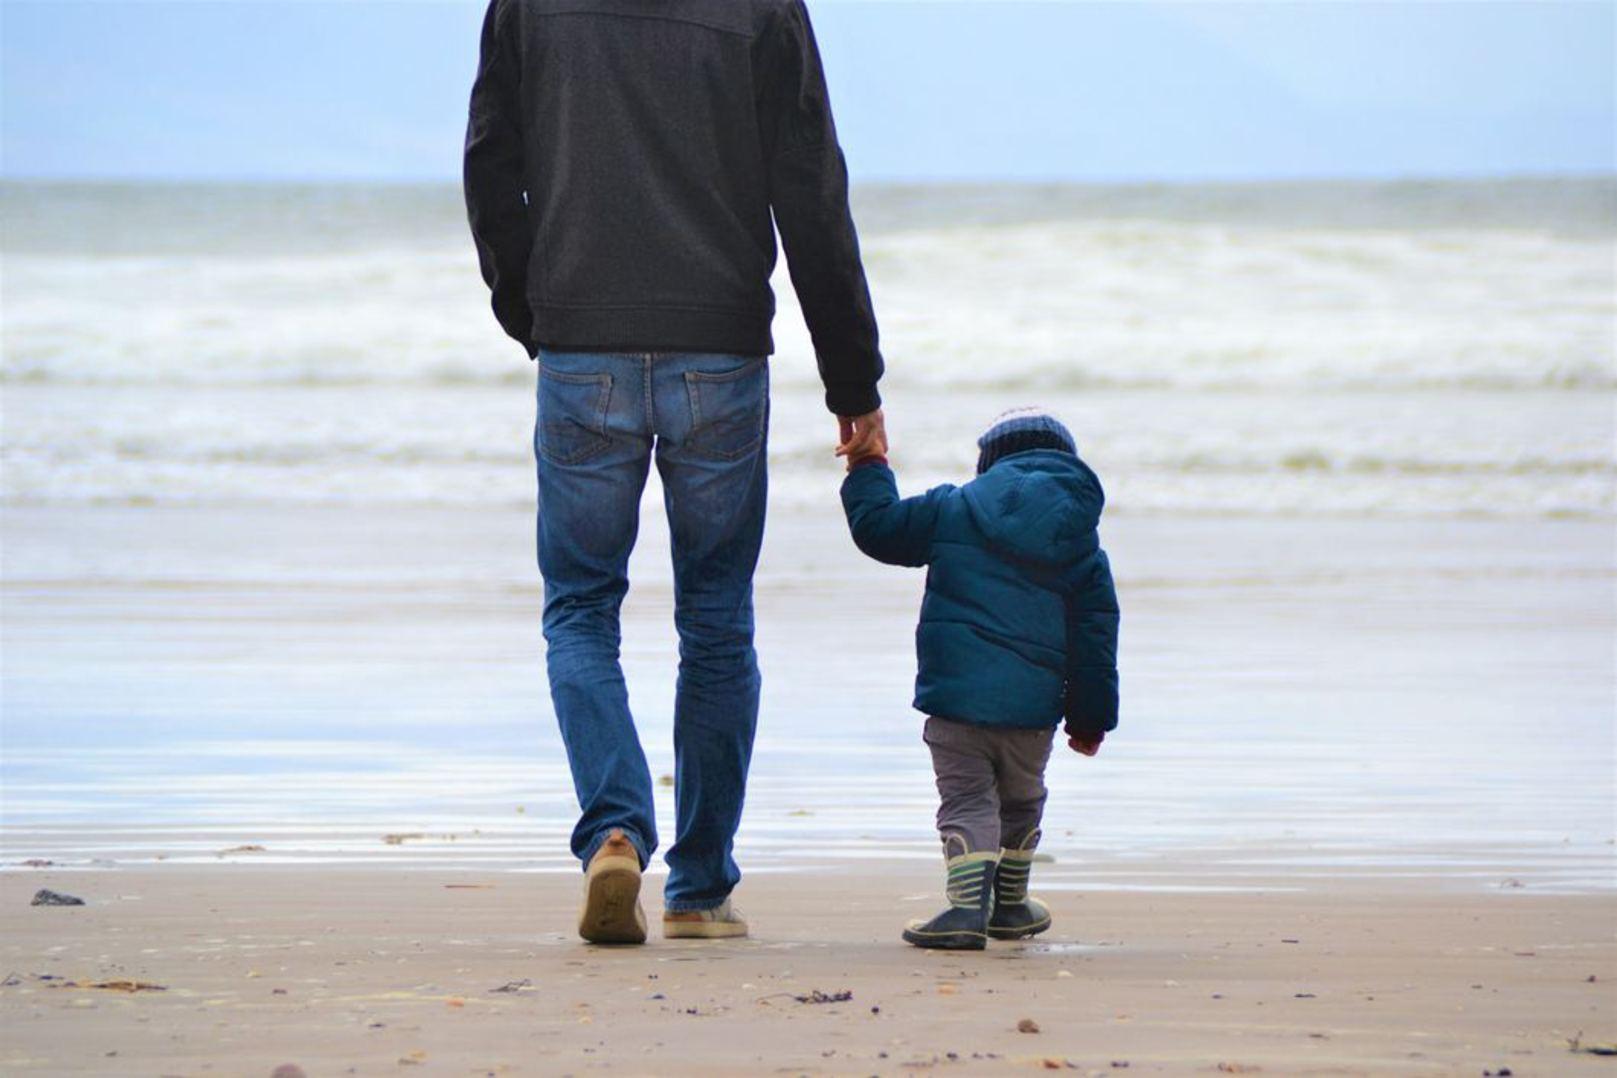 fatherhood photo.jpg